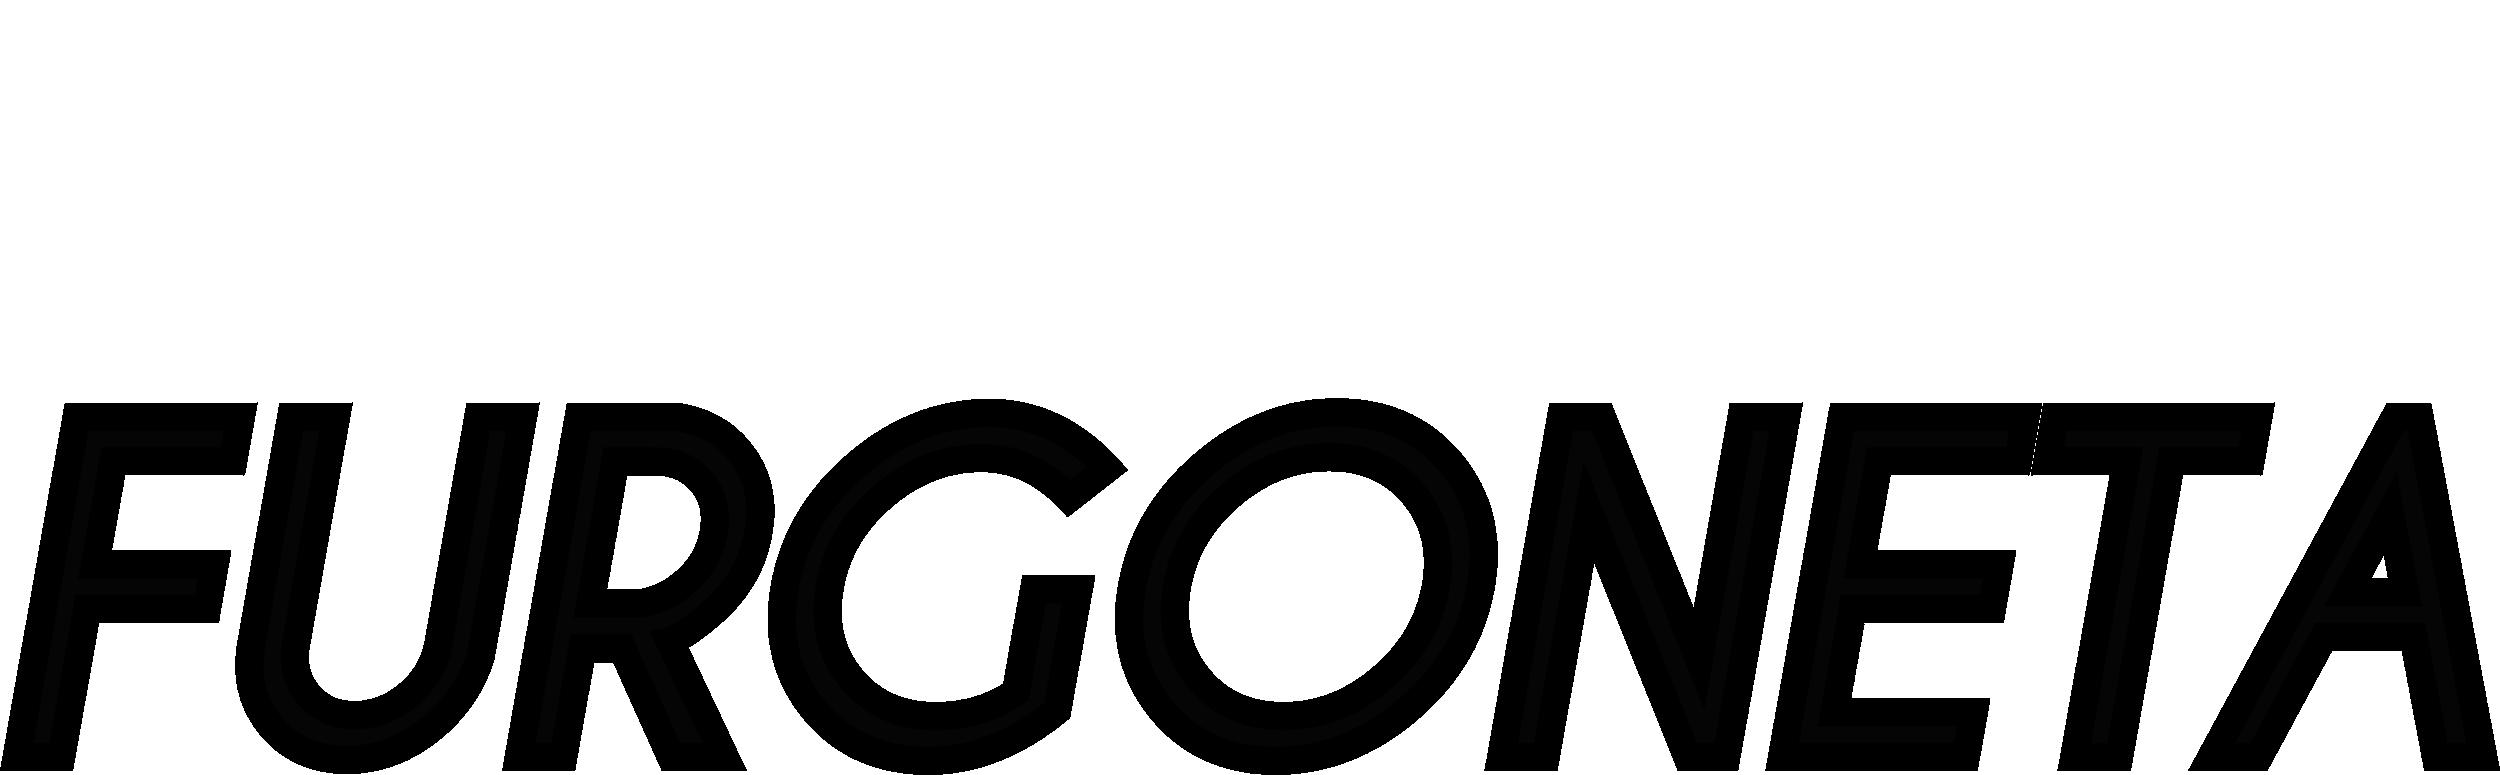 rotulatufurgoneta.com